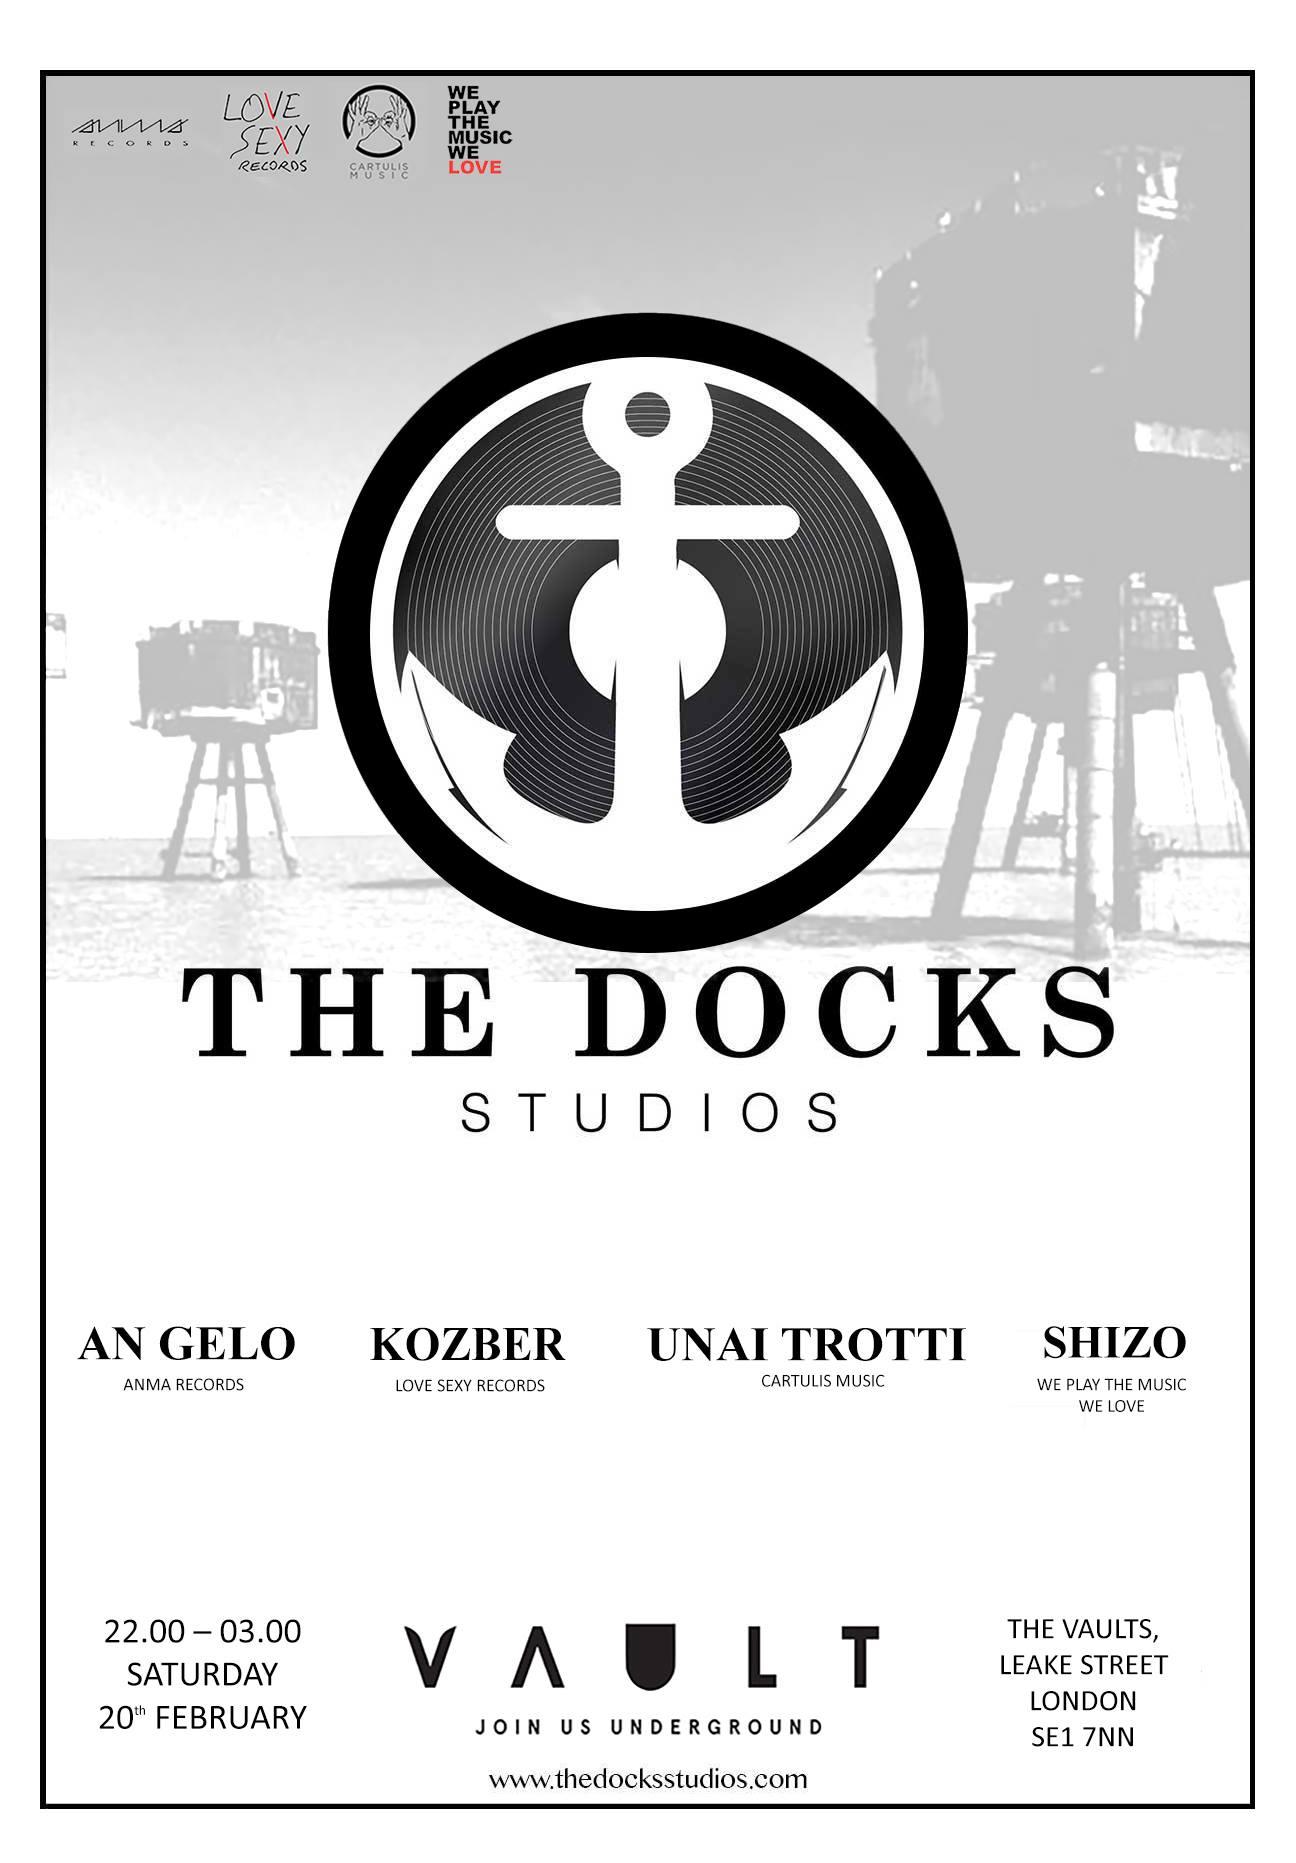 dockartwork.jpg